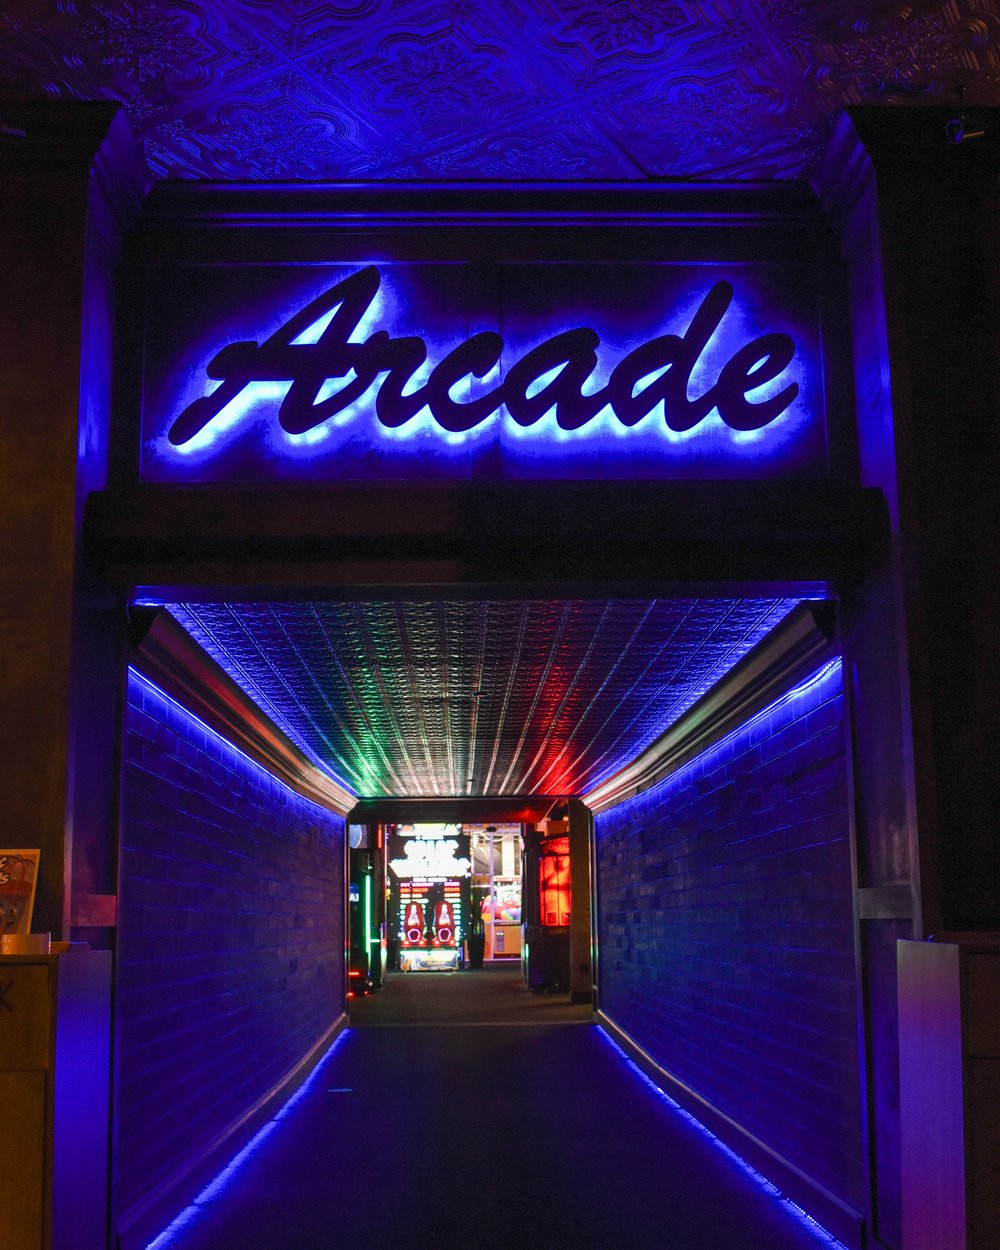 amusement-arcade-bright-1293261.jpg